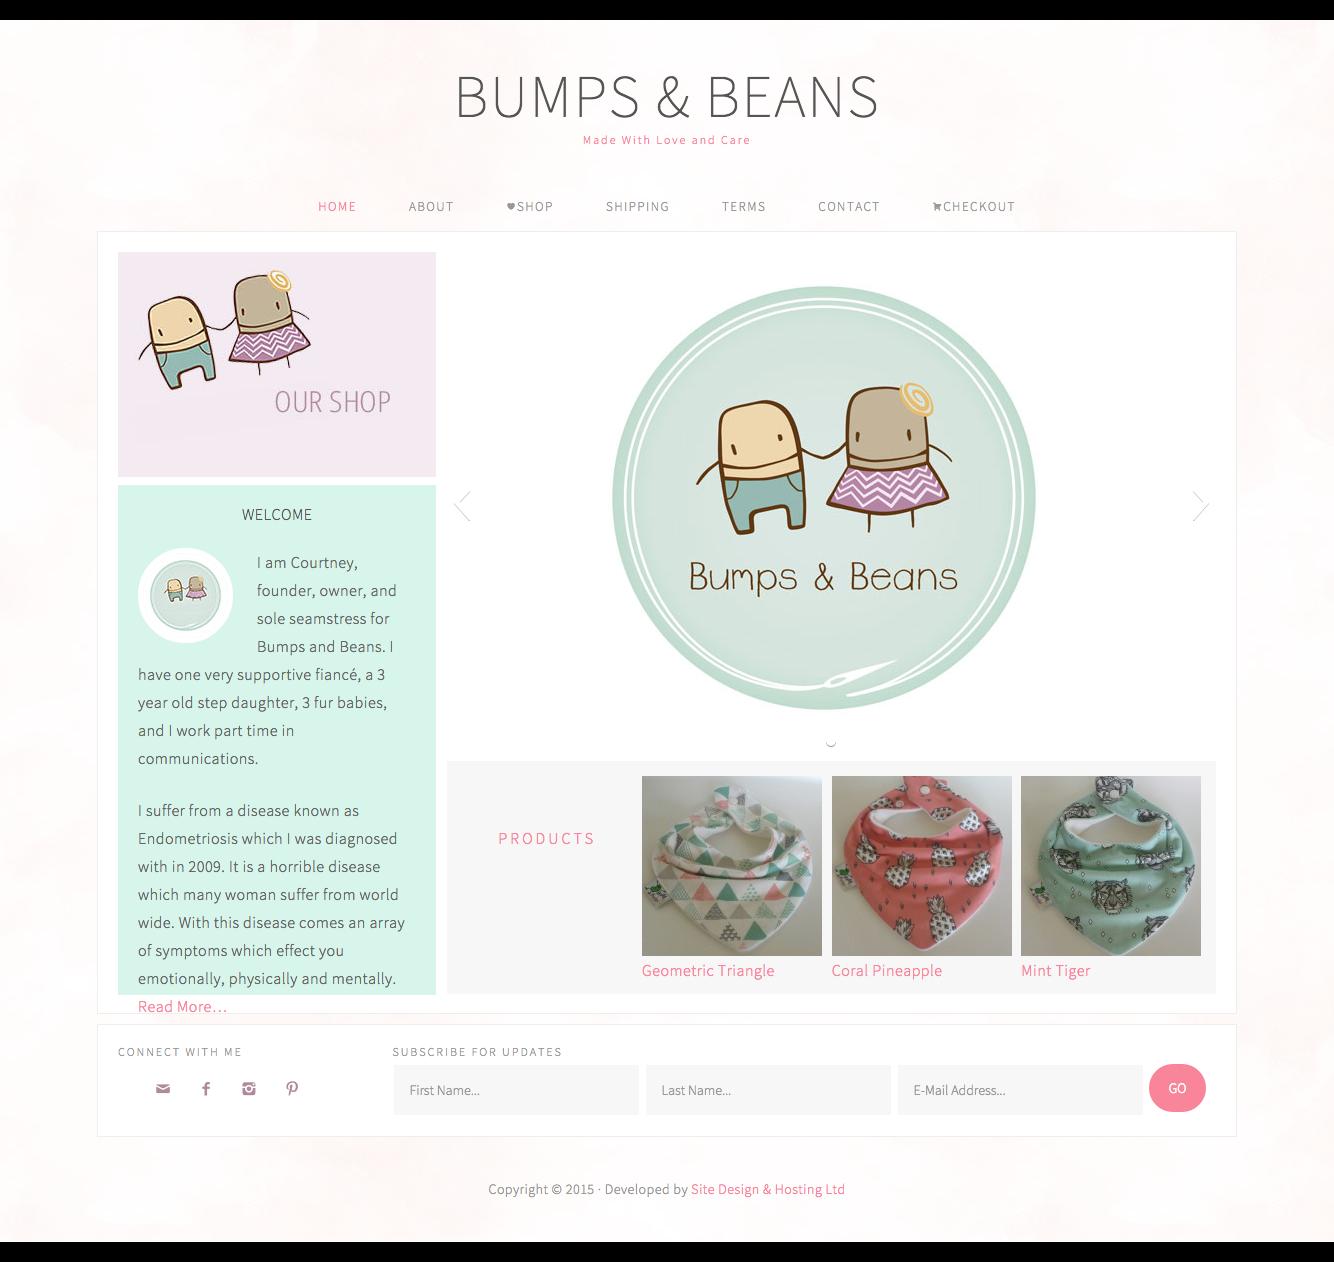 Website Design - Bumps & Beans